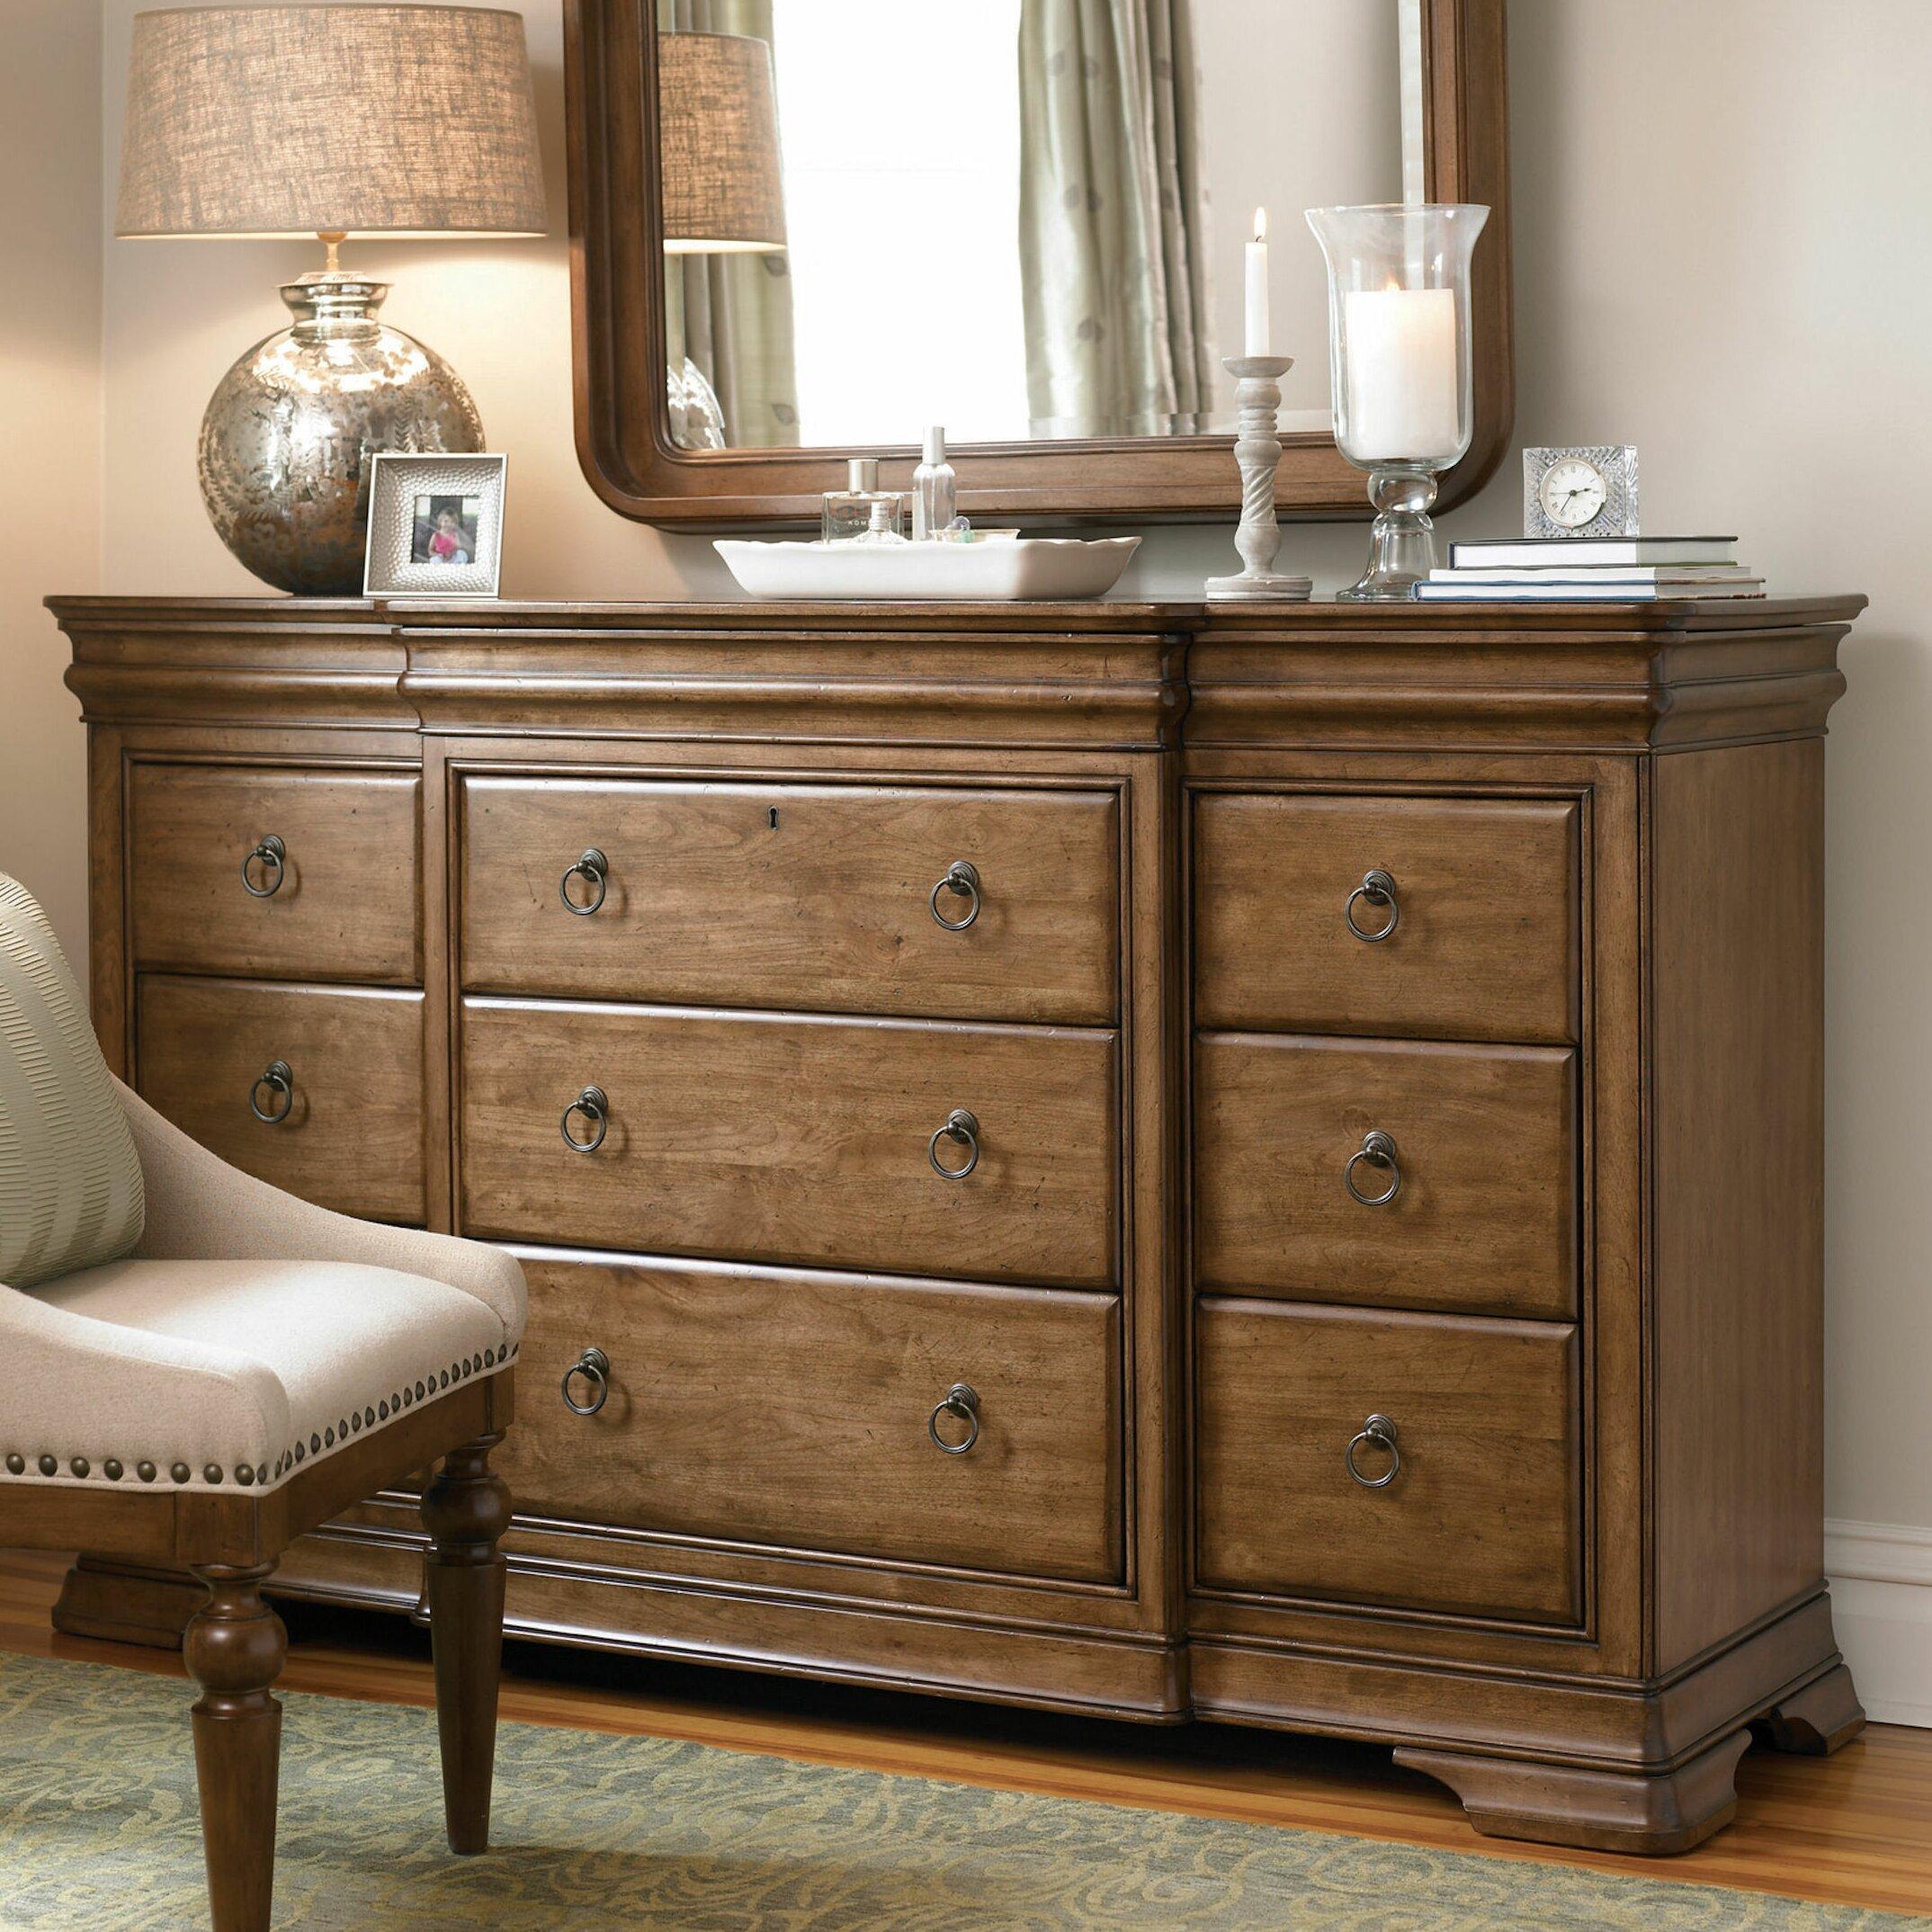 Universal furniture new lou sleigh customizable bedroom - Universal broadmoore bedroom furniture ...